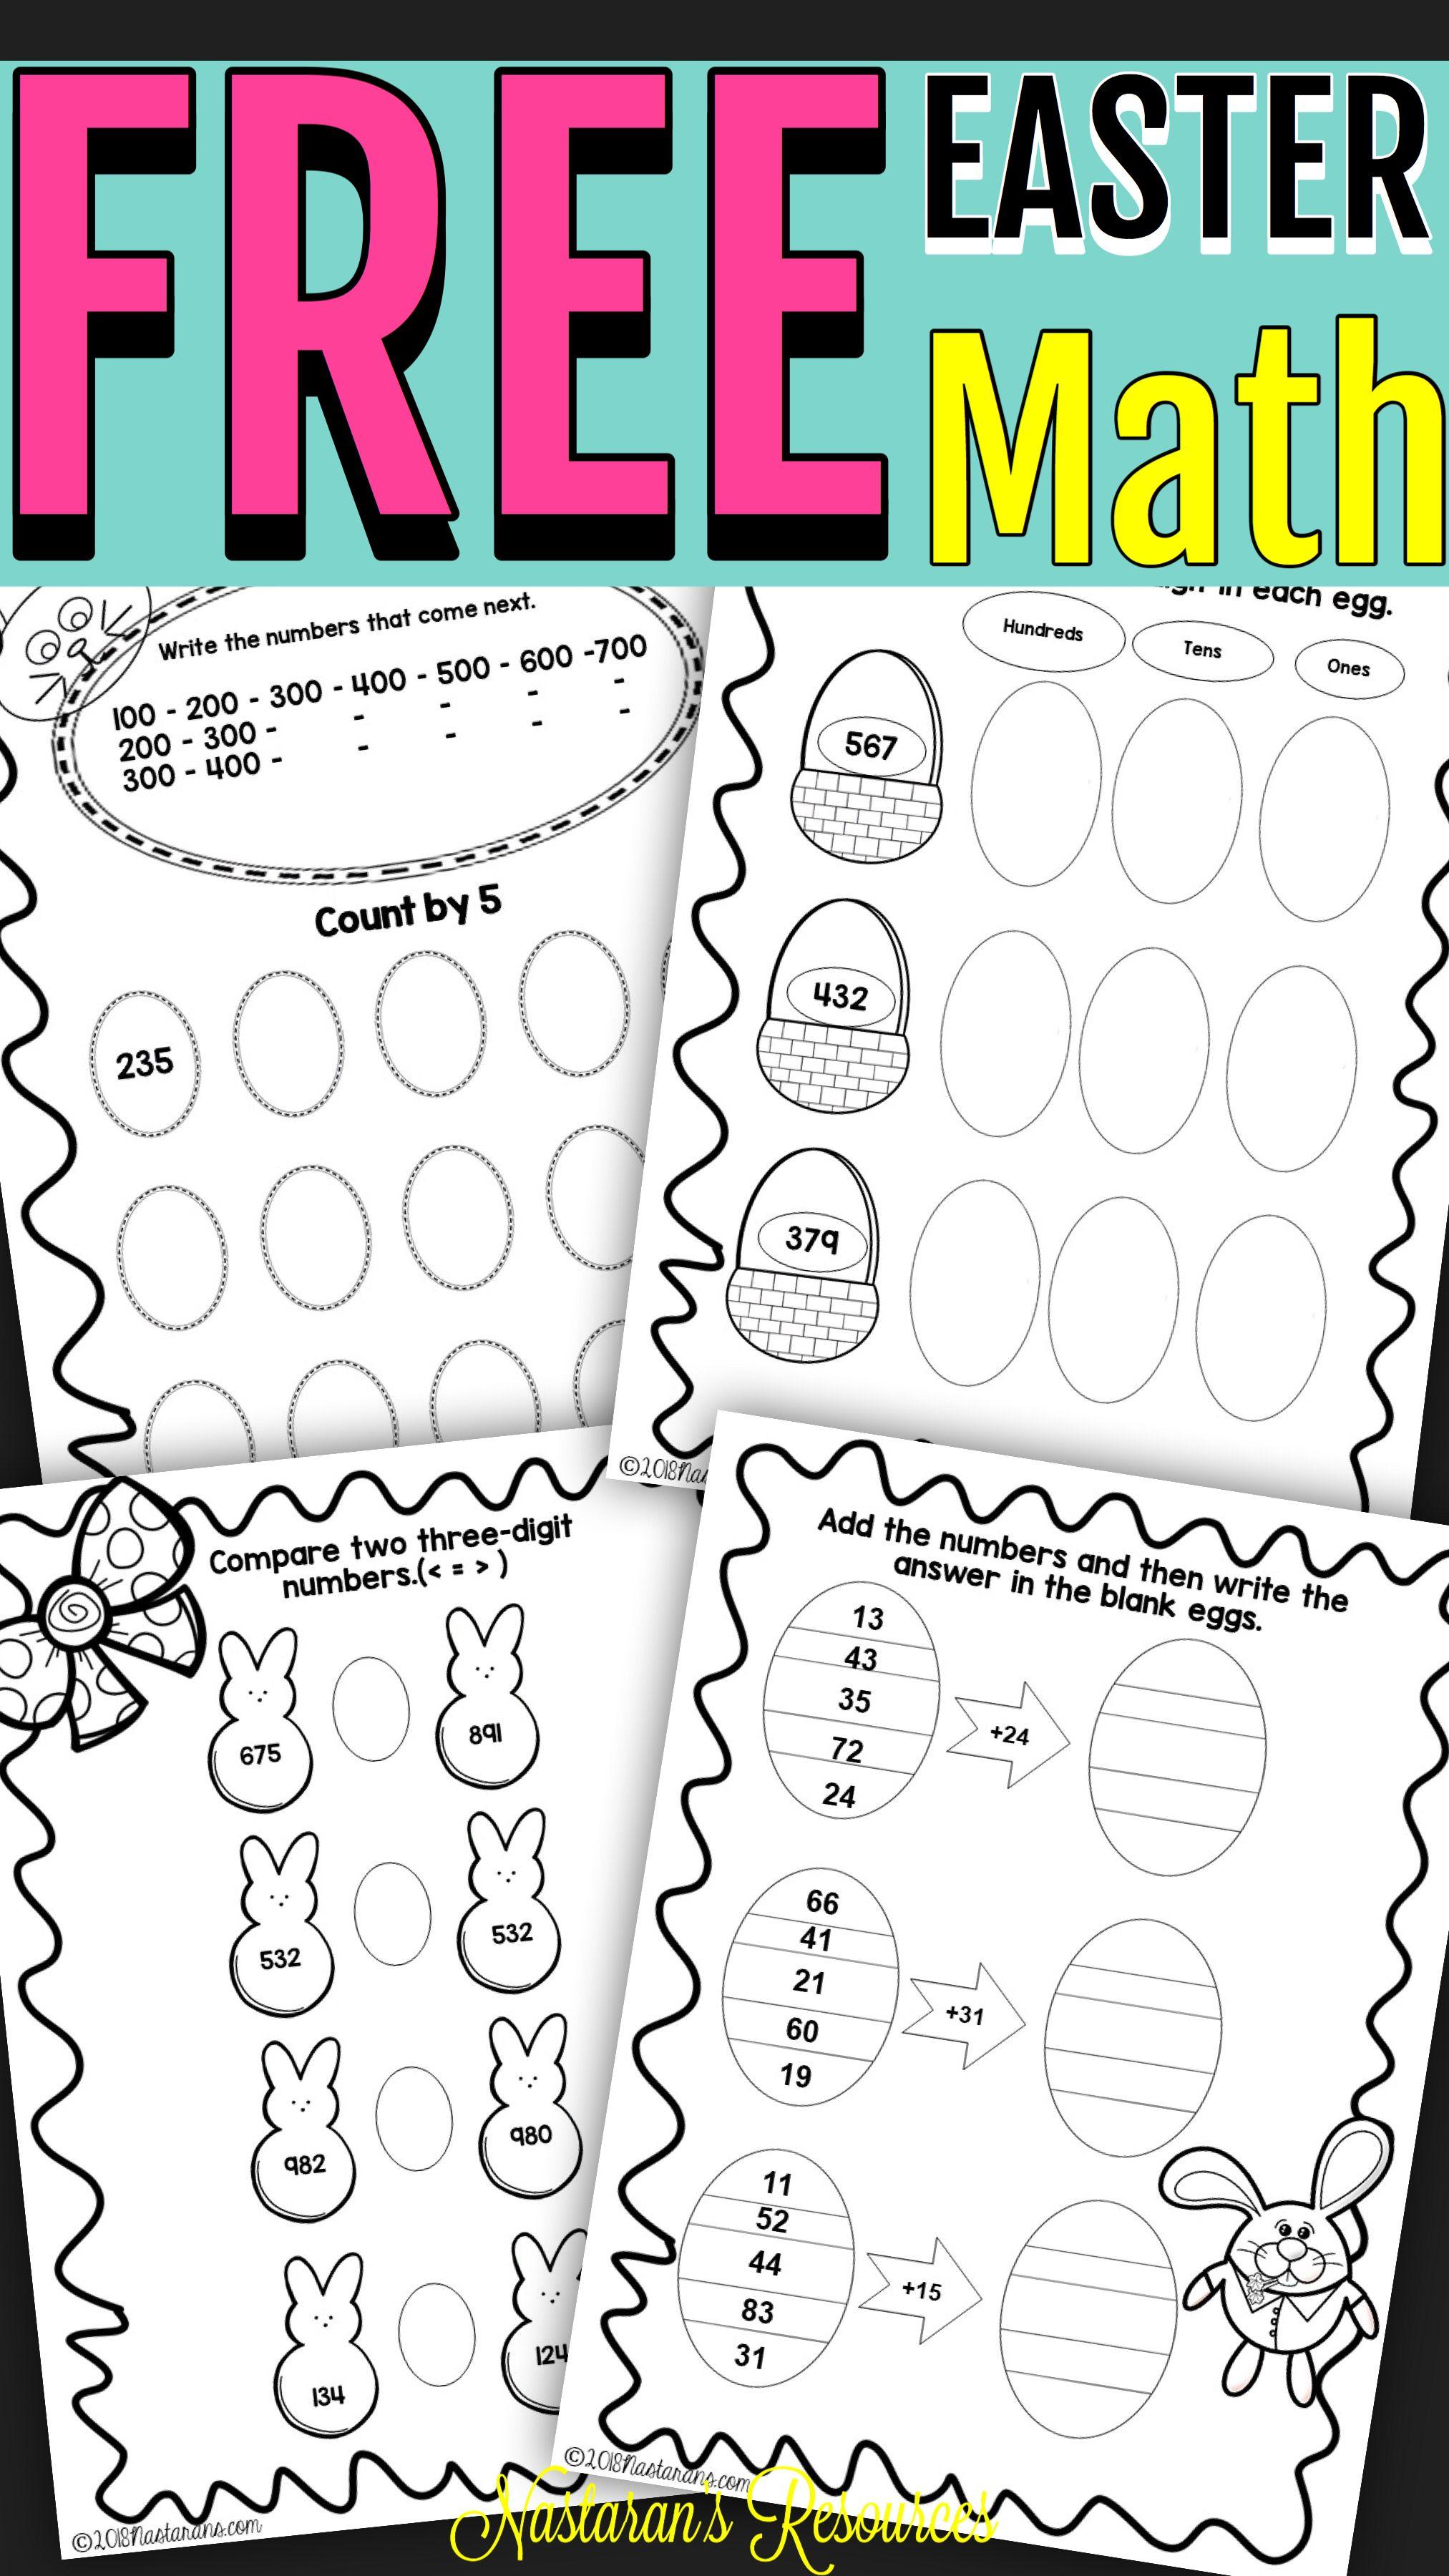 Free Easter Math Worksheets